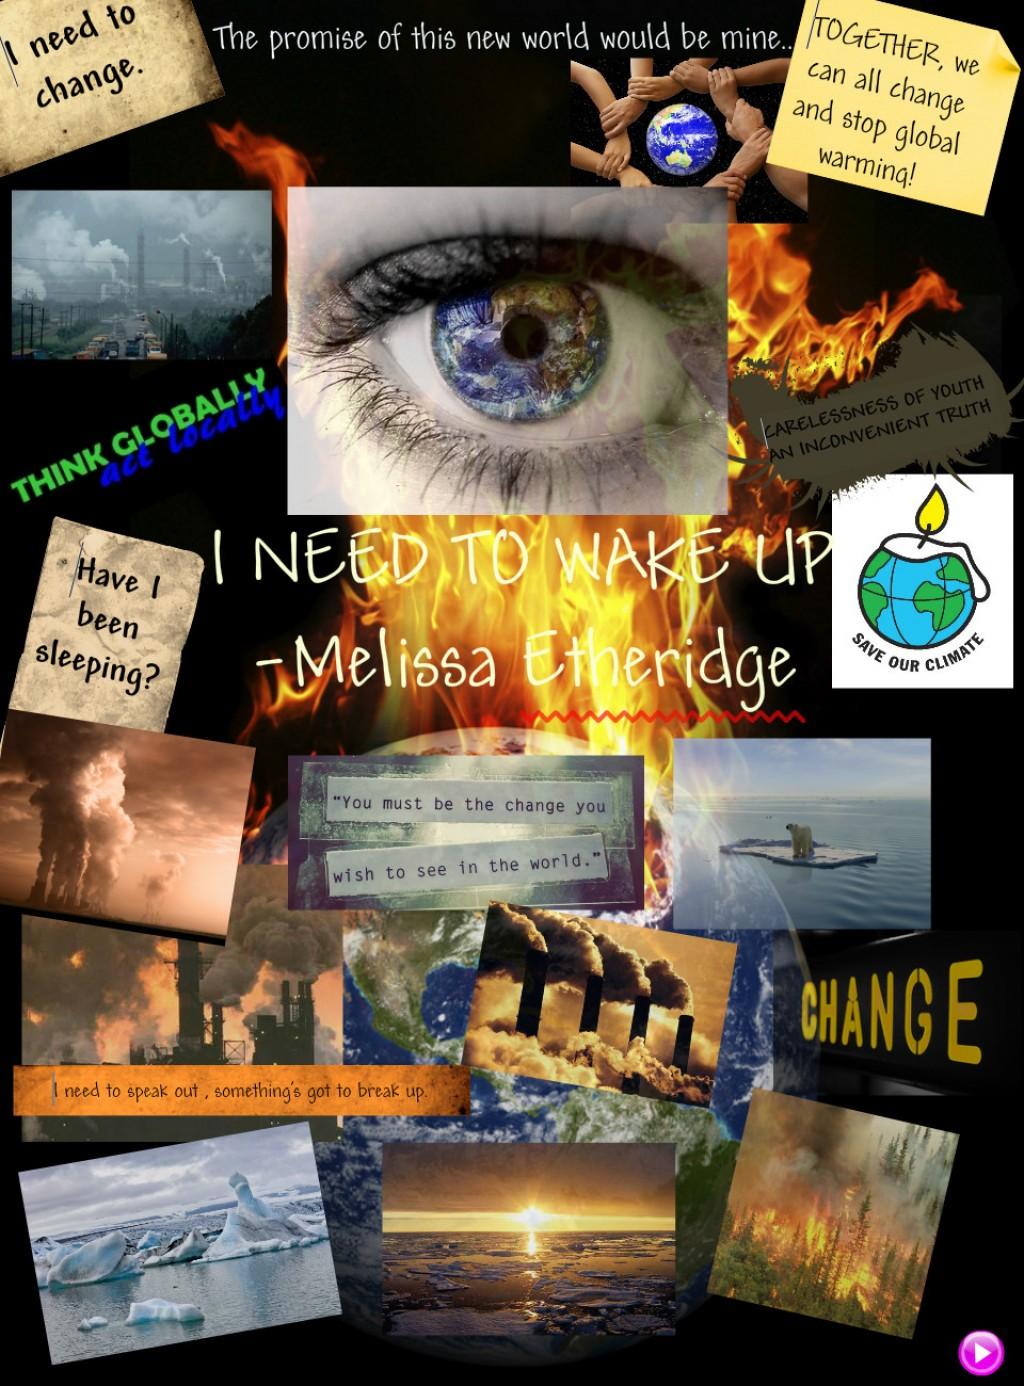 008 Essay Example Visual I Need To Wake Up Melissa Etheridge Verbal Shocking Response Examples Literacy Arts Large